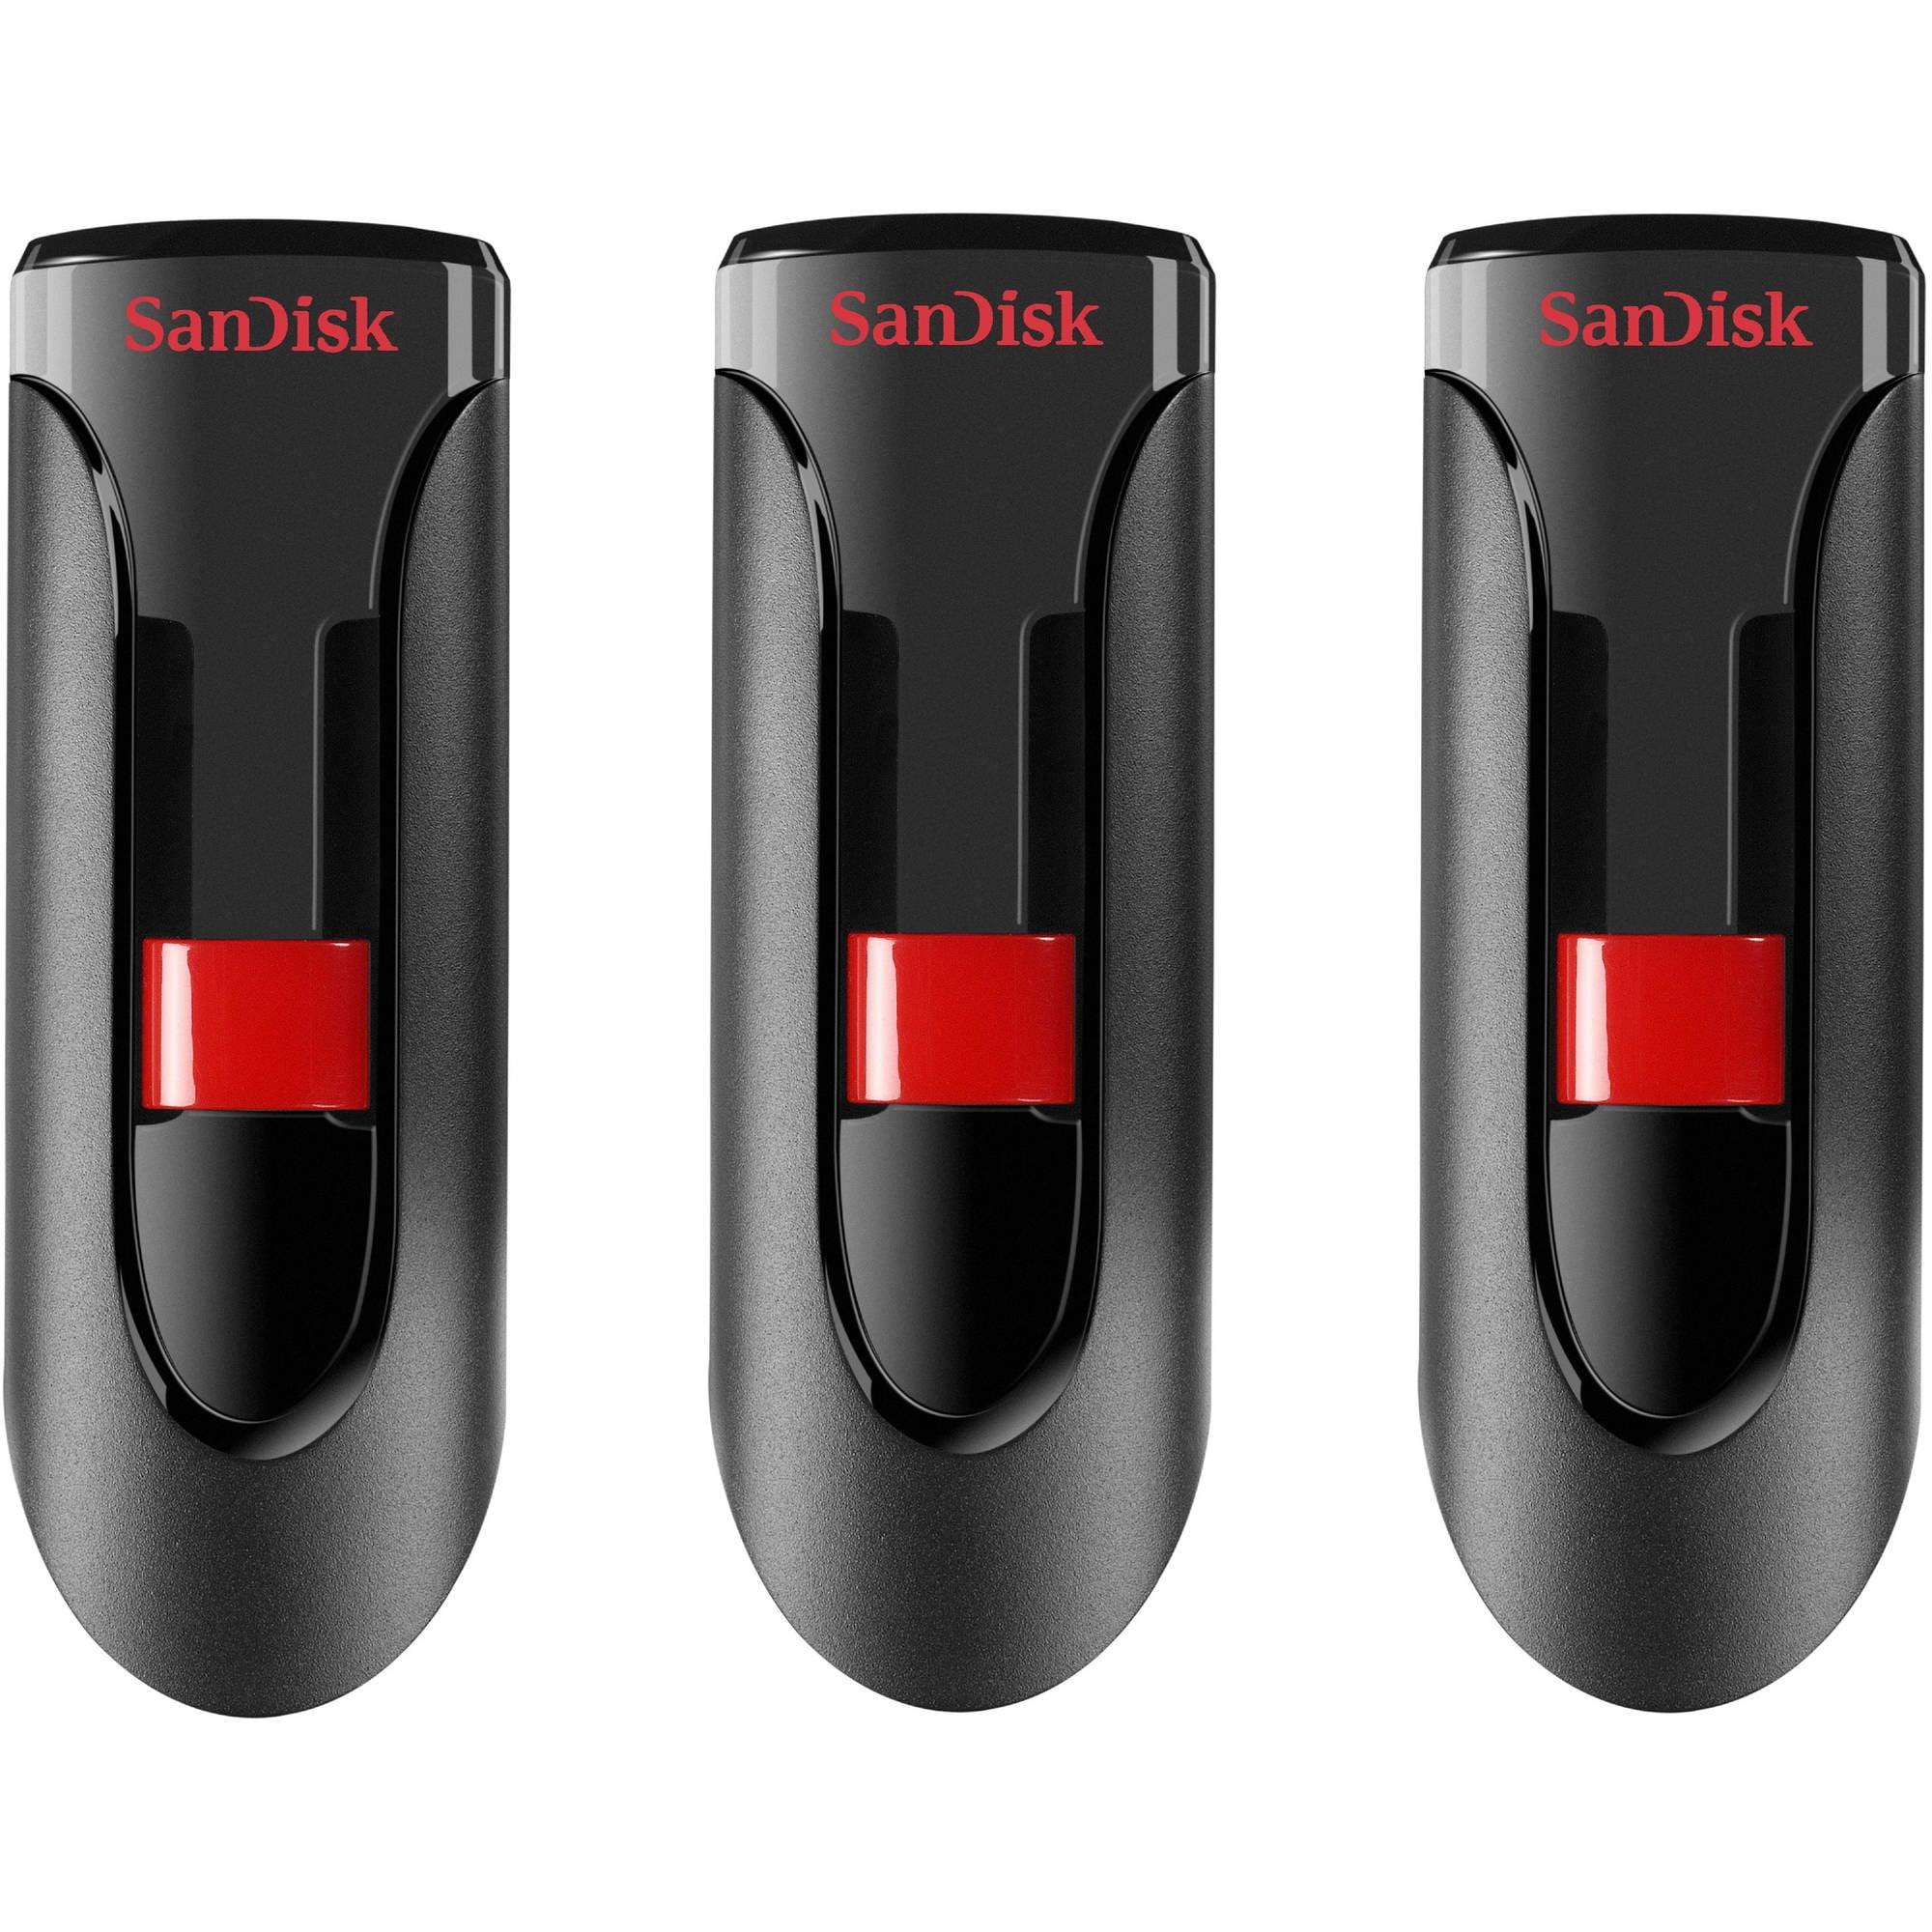 SanDisk Cruzer Glide 16GB USB 2.0 Flash Drive, 3-Pack